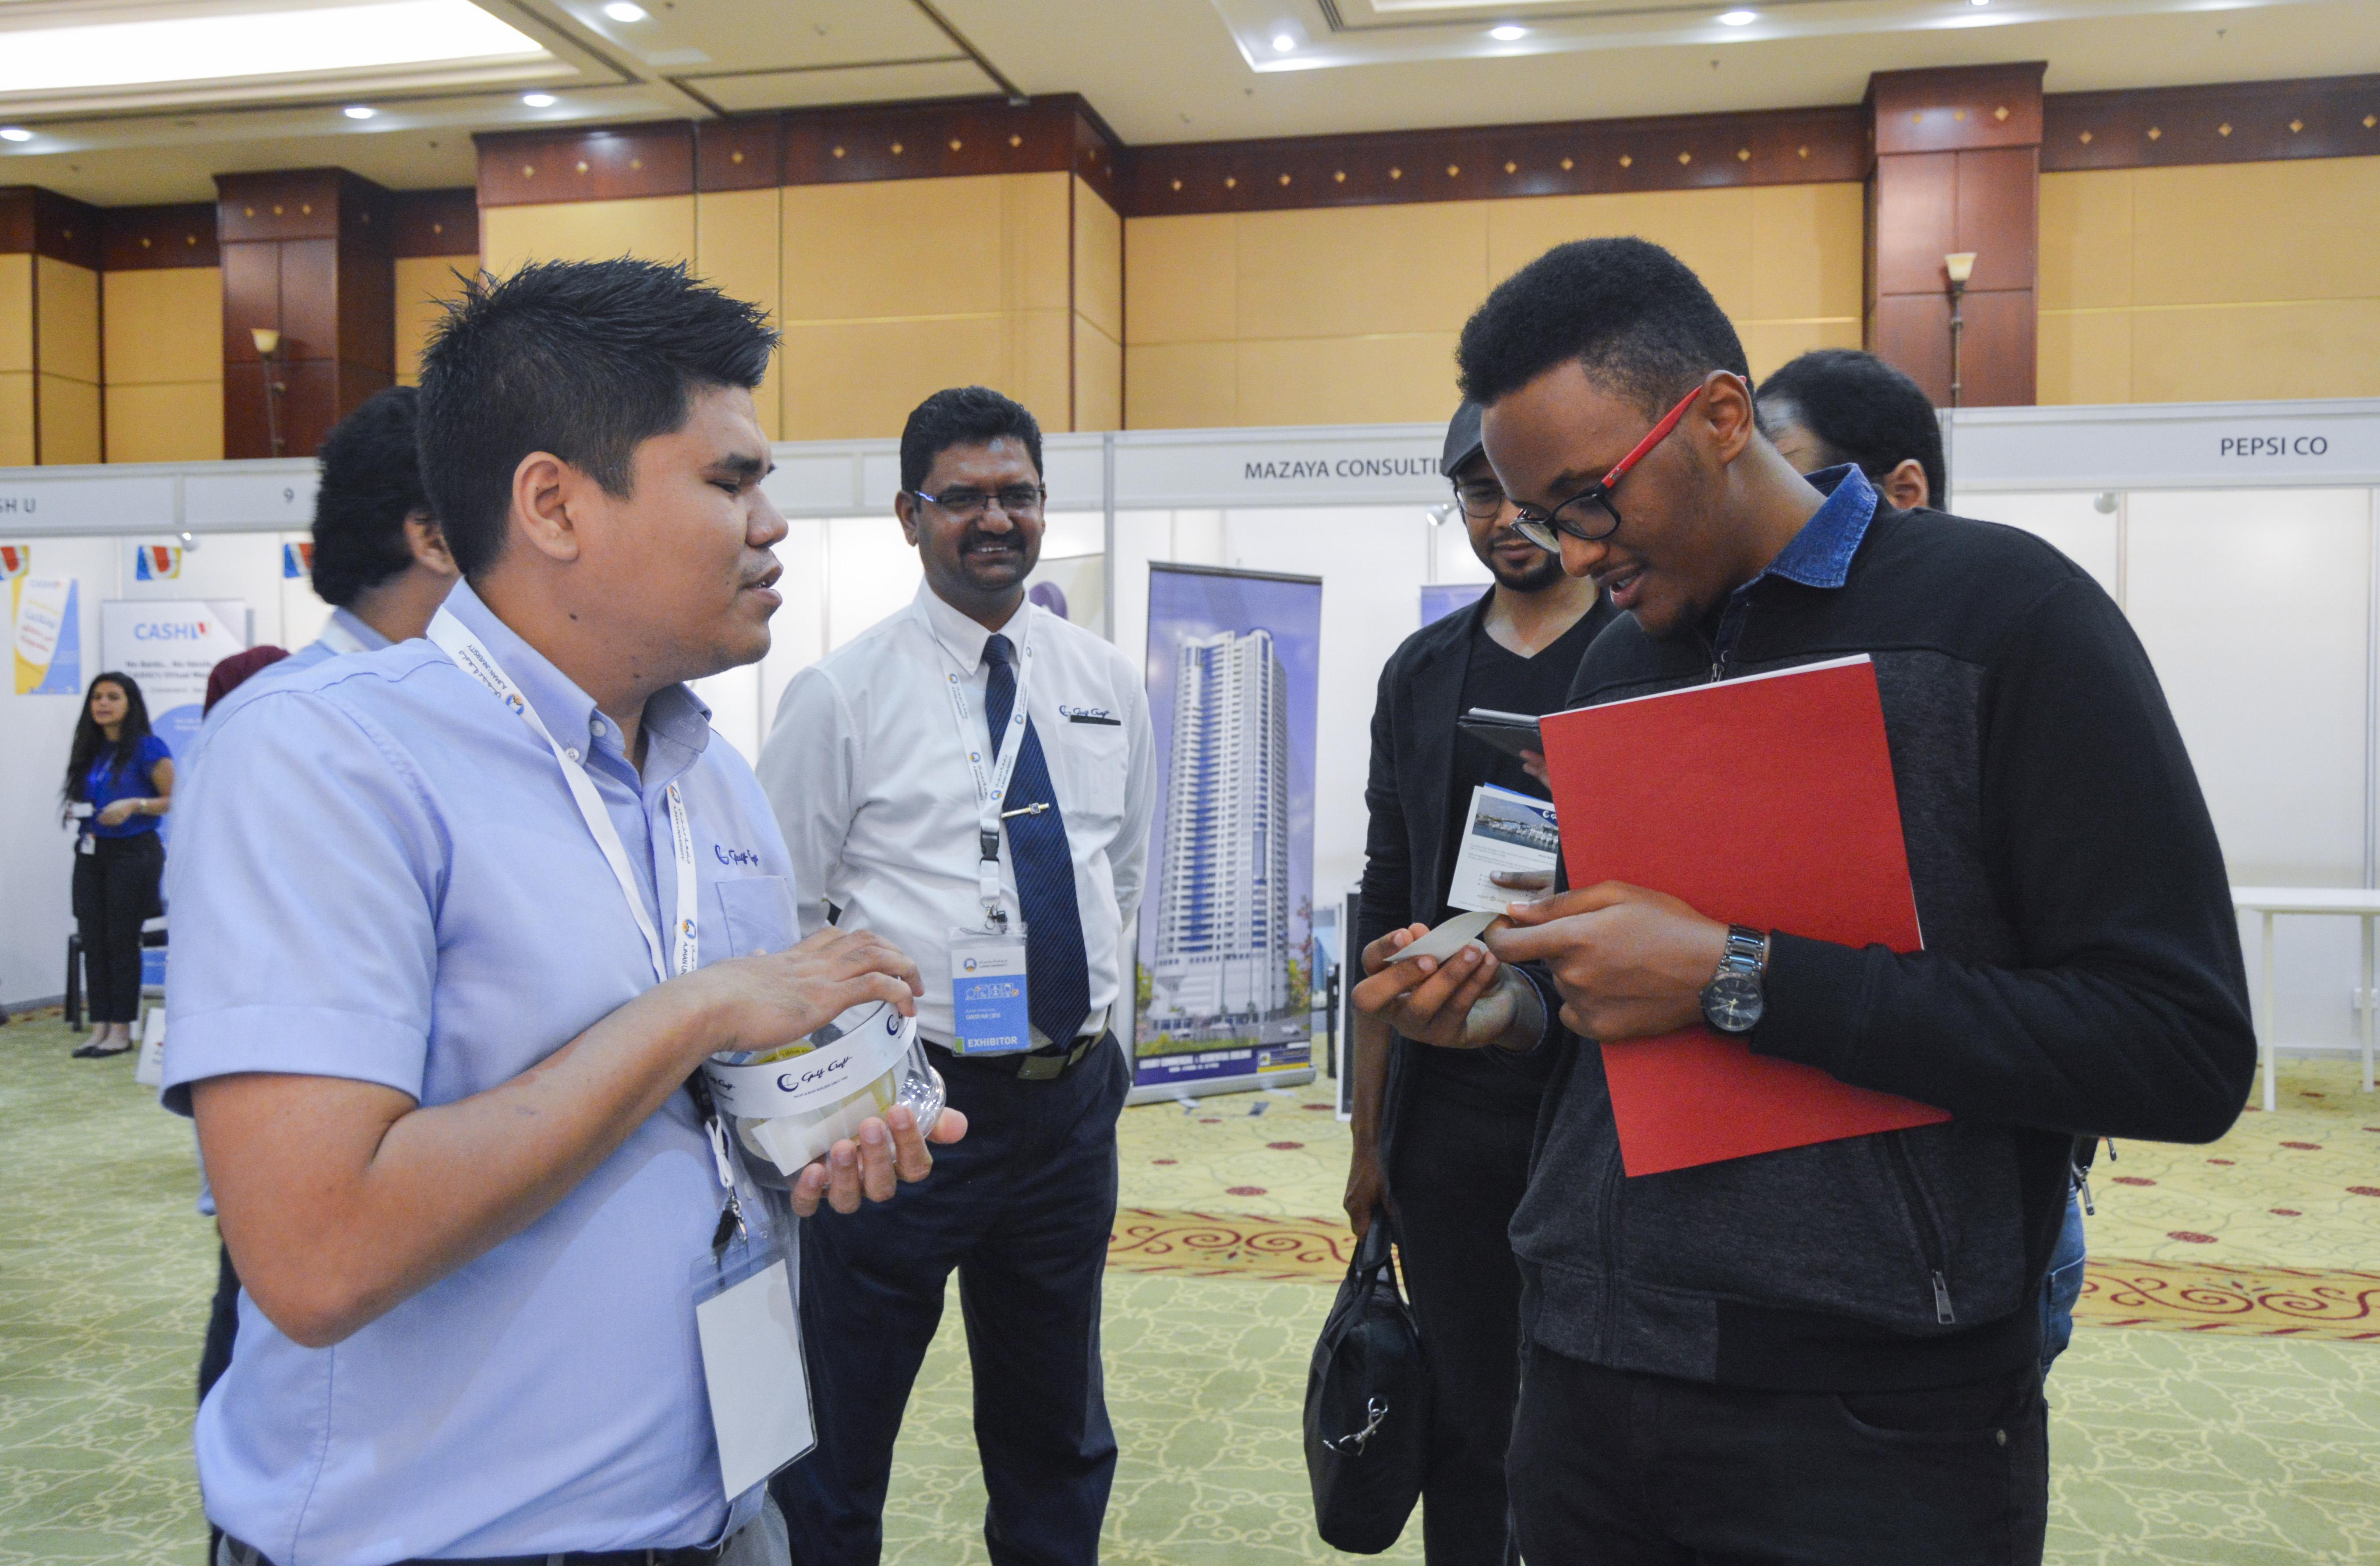 Gulf Craft at Ajman University Job Fair 2018 (16).jpg